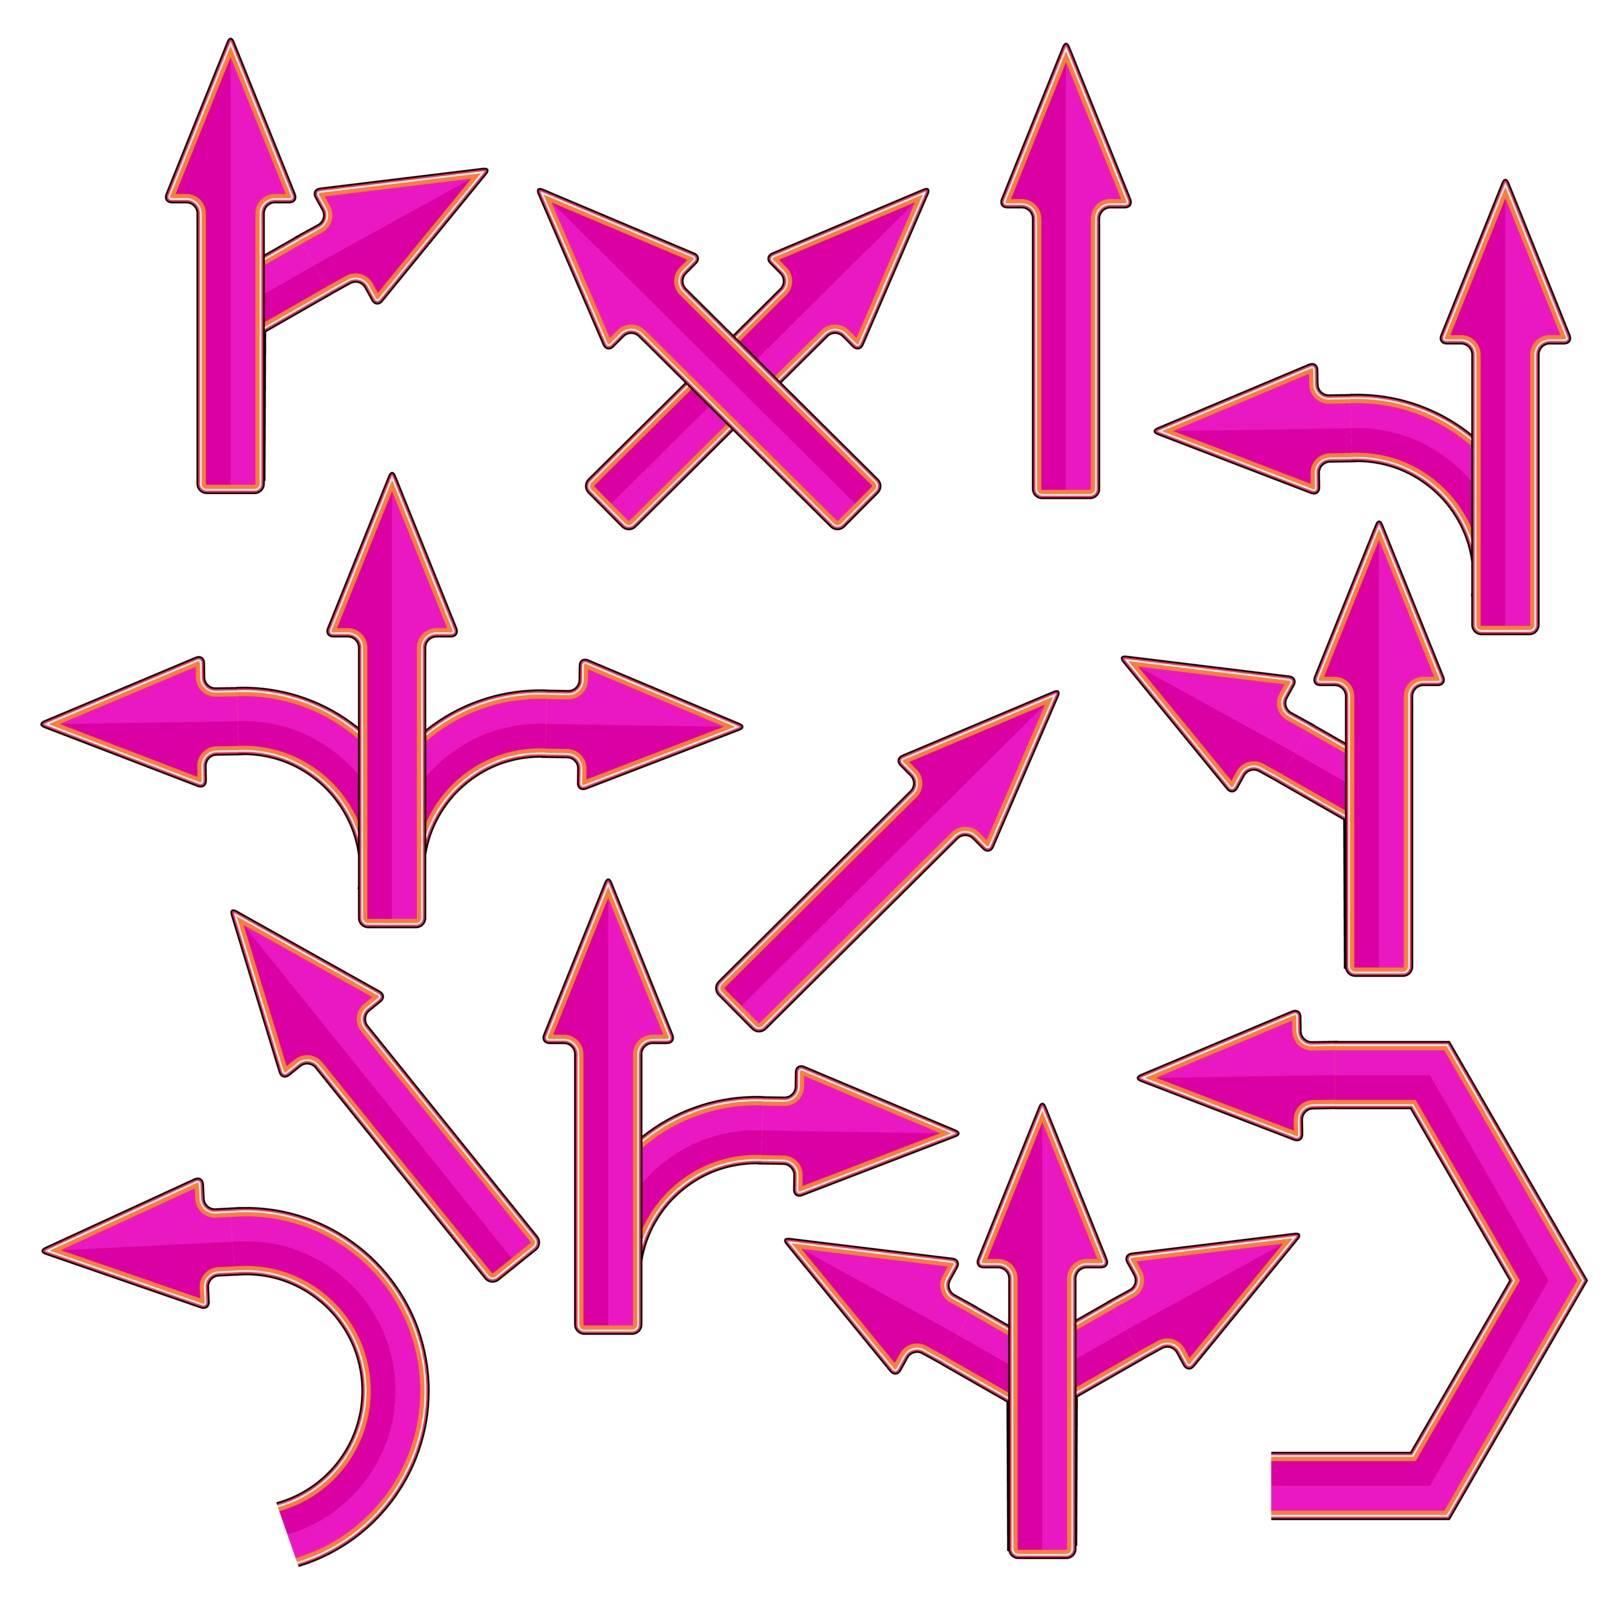 Set of Pink Arrows Isolatedon White Background